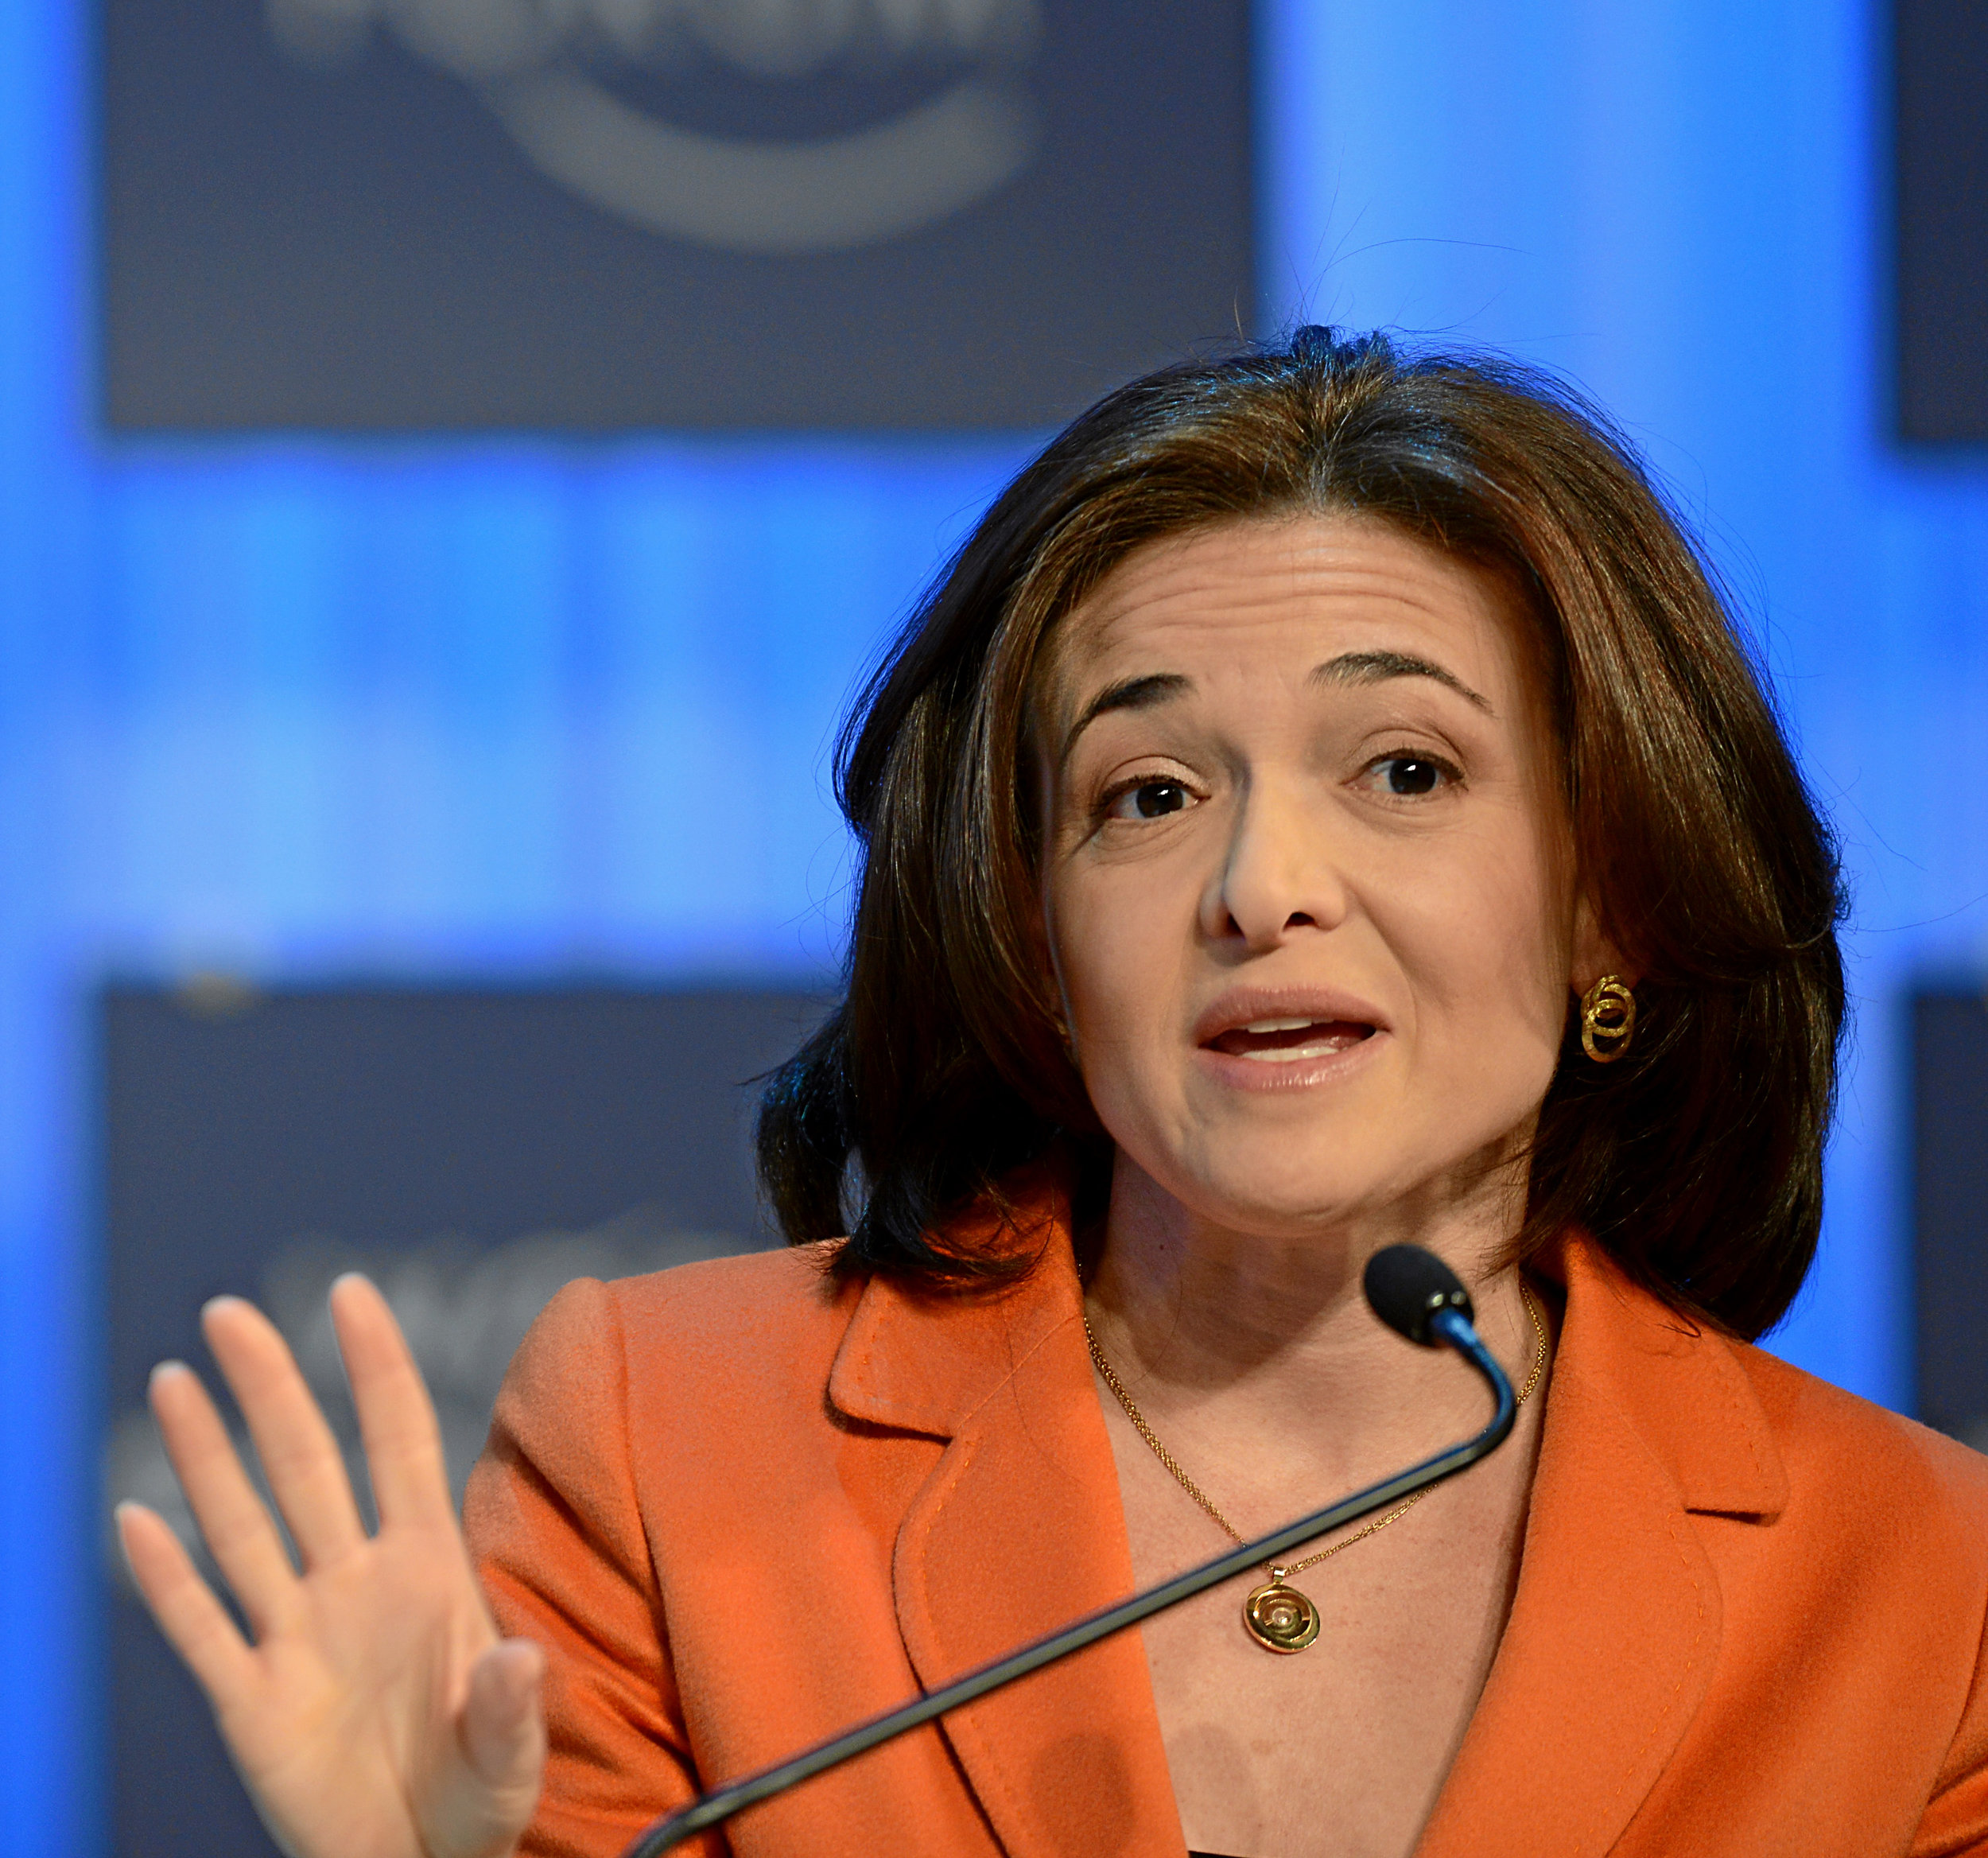 Sheryl_Sandberg_World_Economic_Forum_2013.jpg